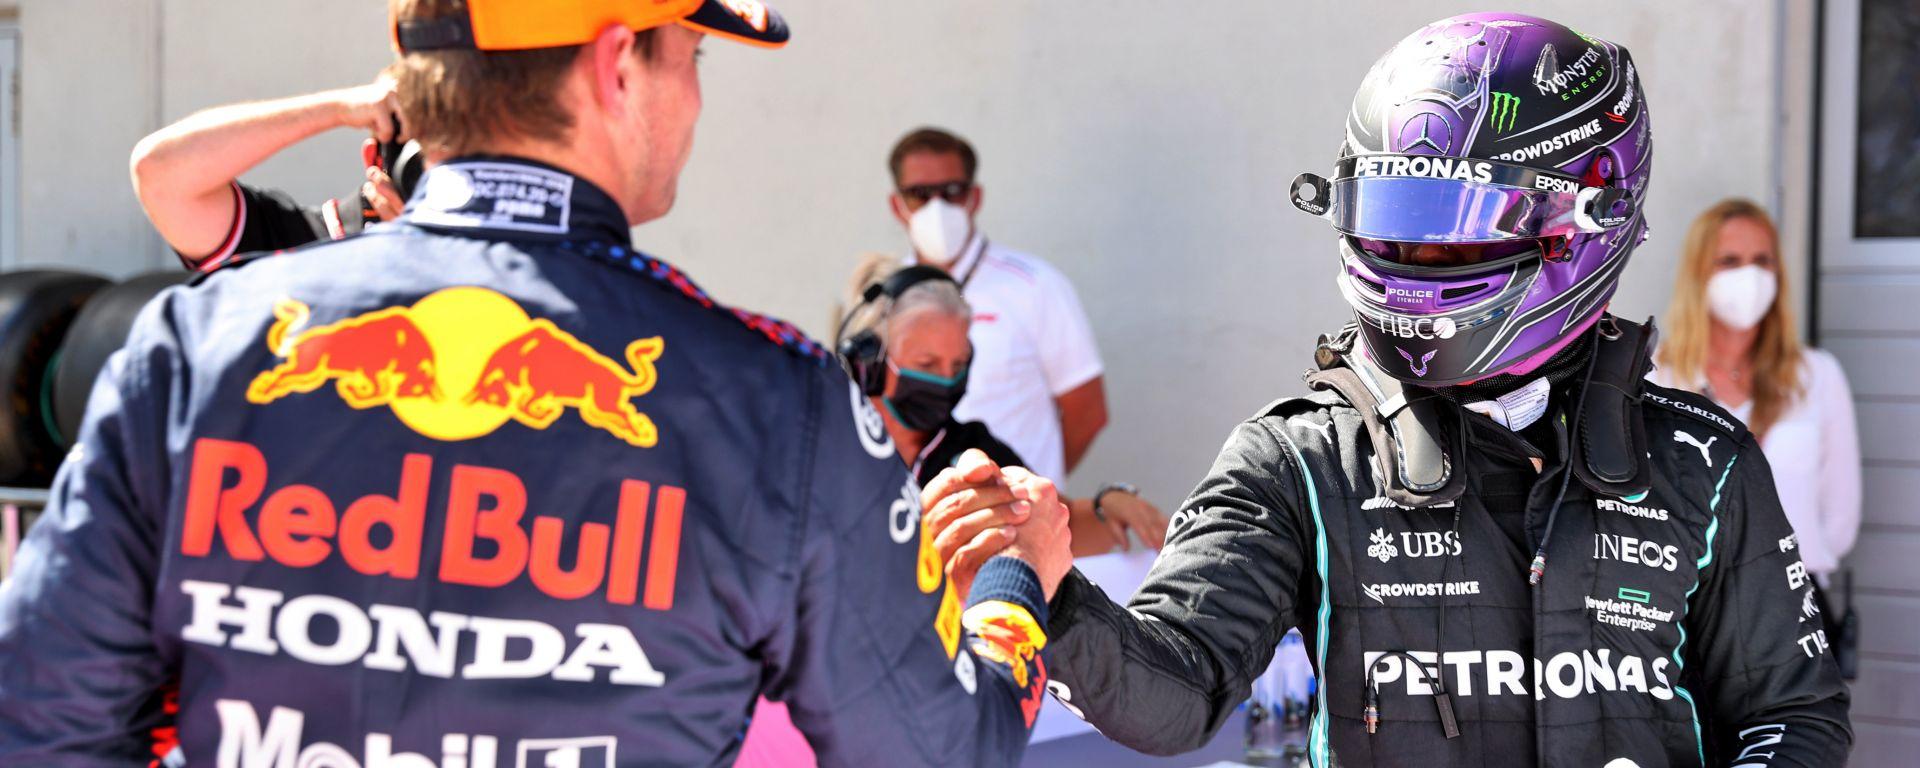 F1 GP Stiria 2021: analisi qualifiche in diretta Instagram - Video